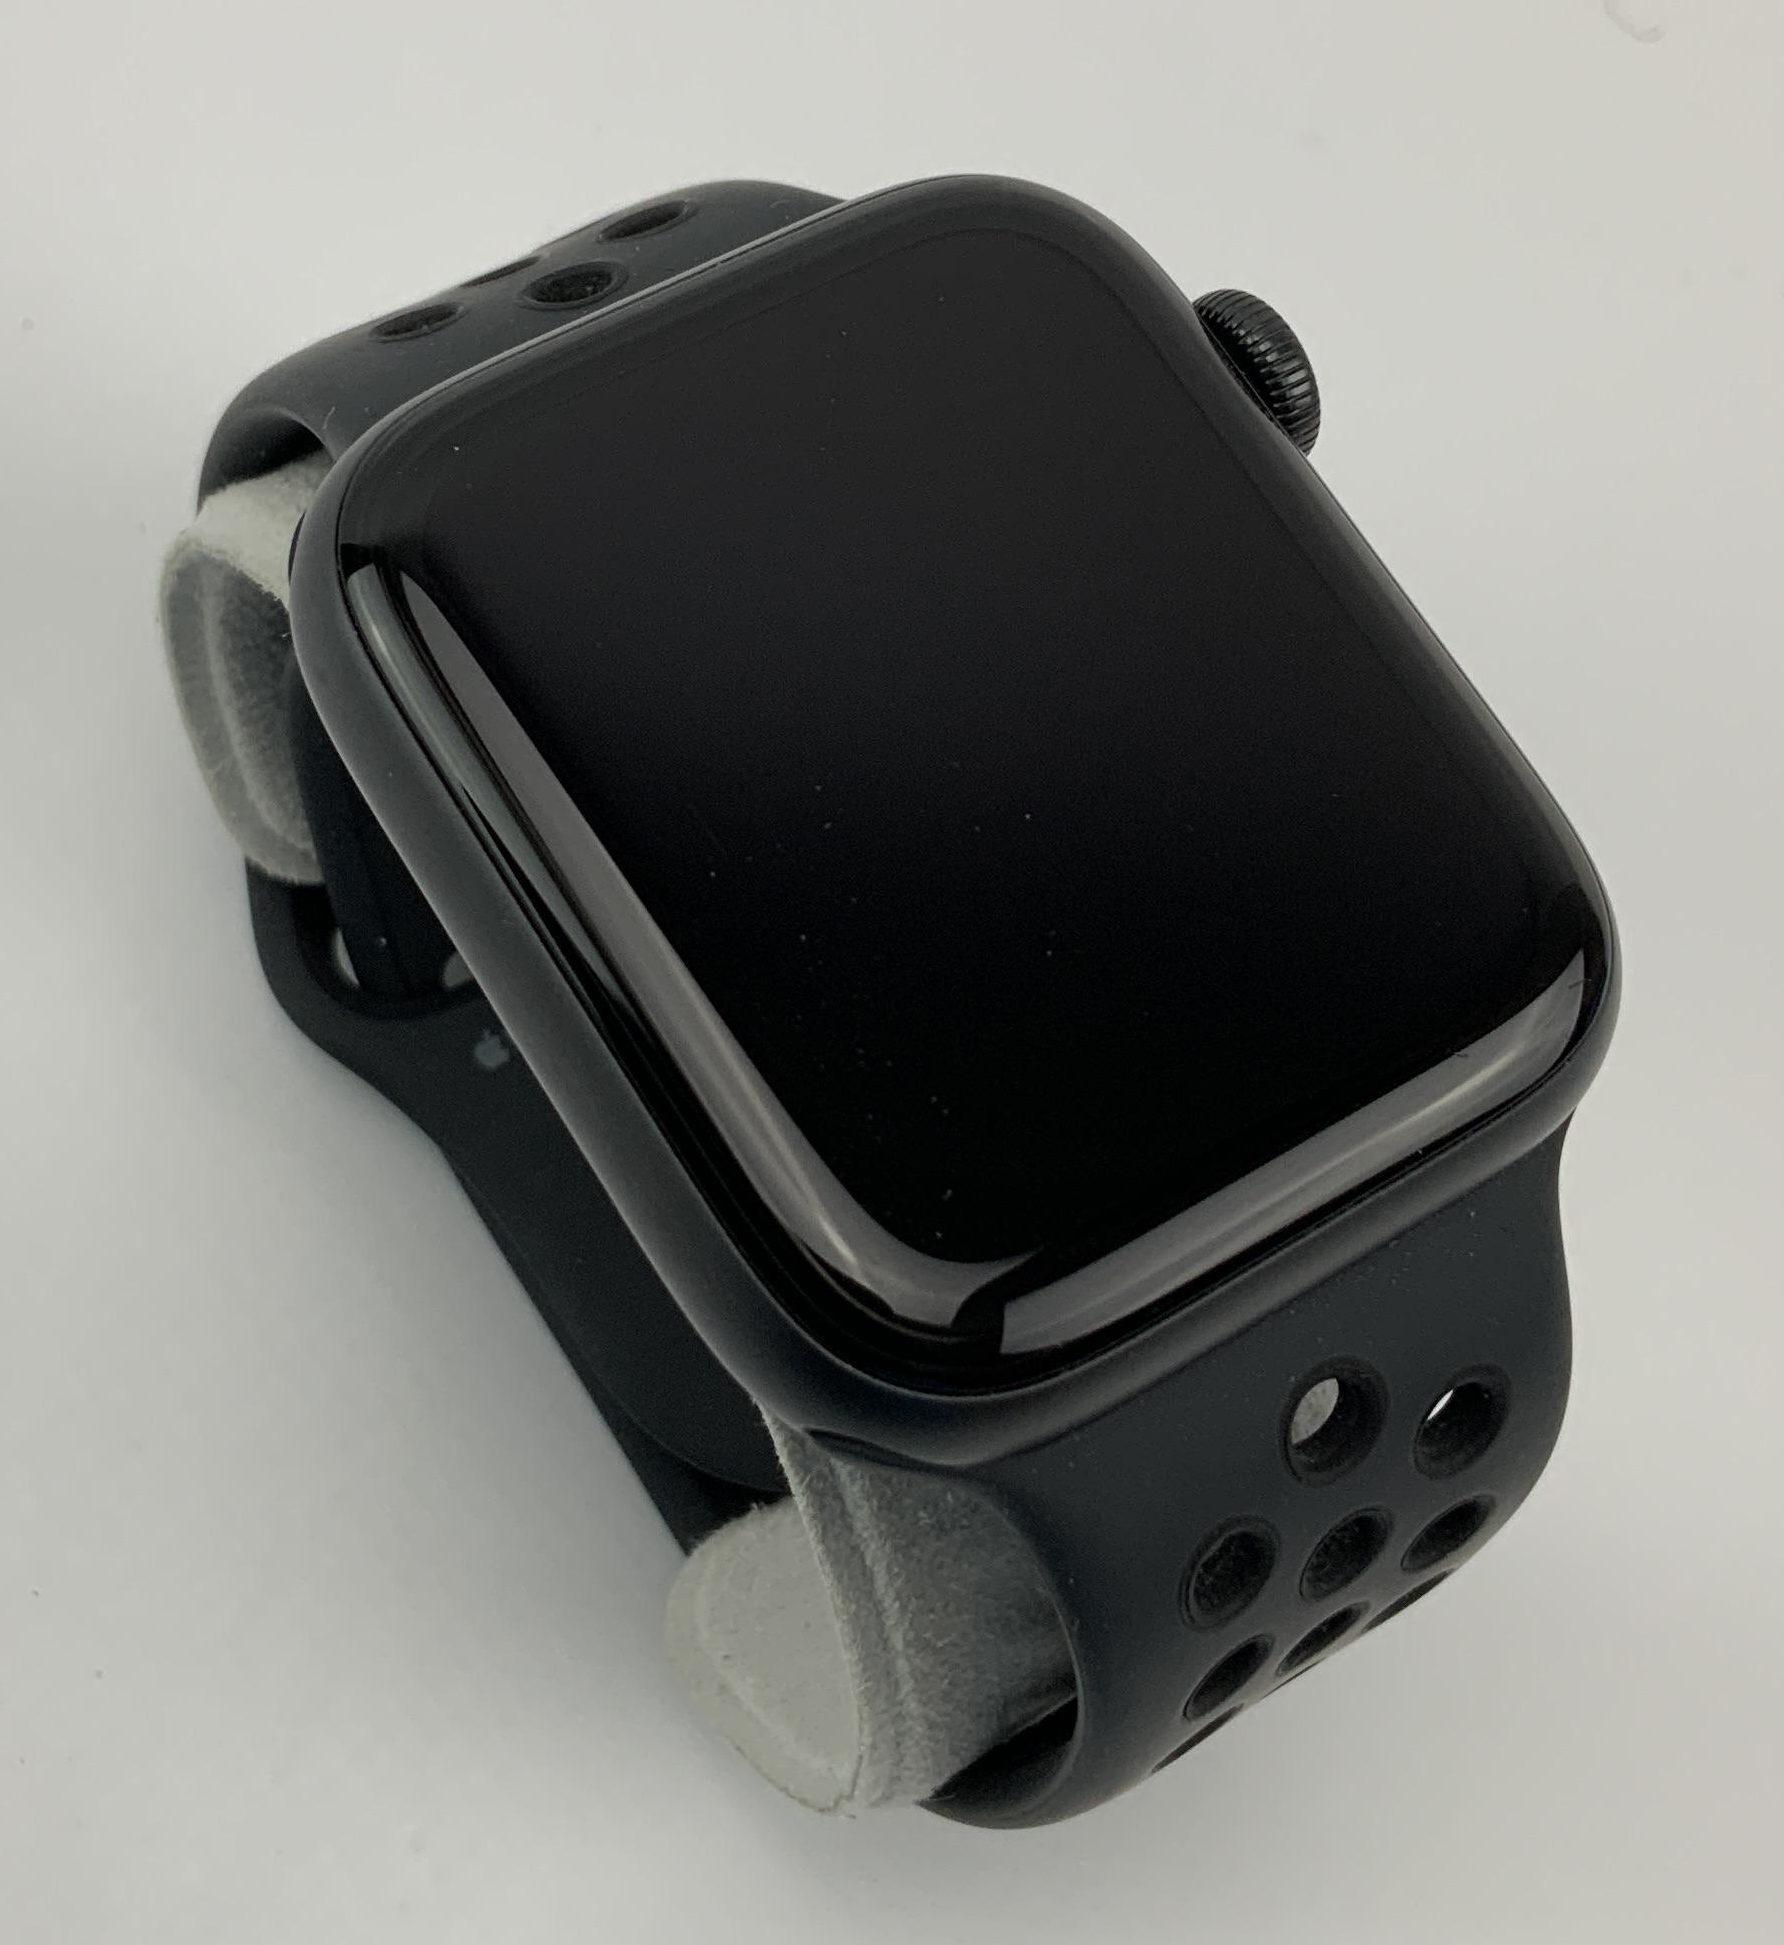 Watch Series 6 Aluminum Cellular (44mm), Space Gray, Kuva 2